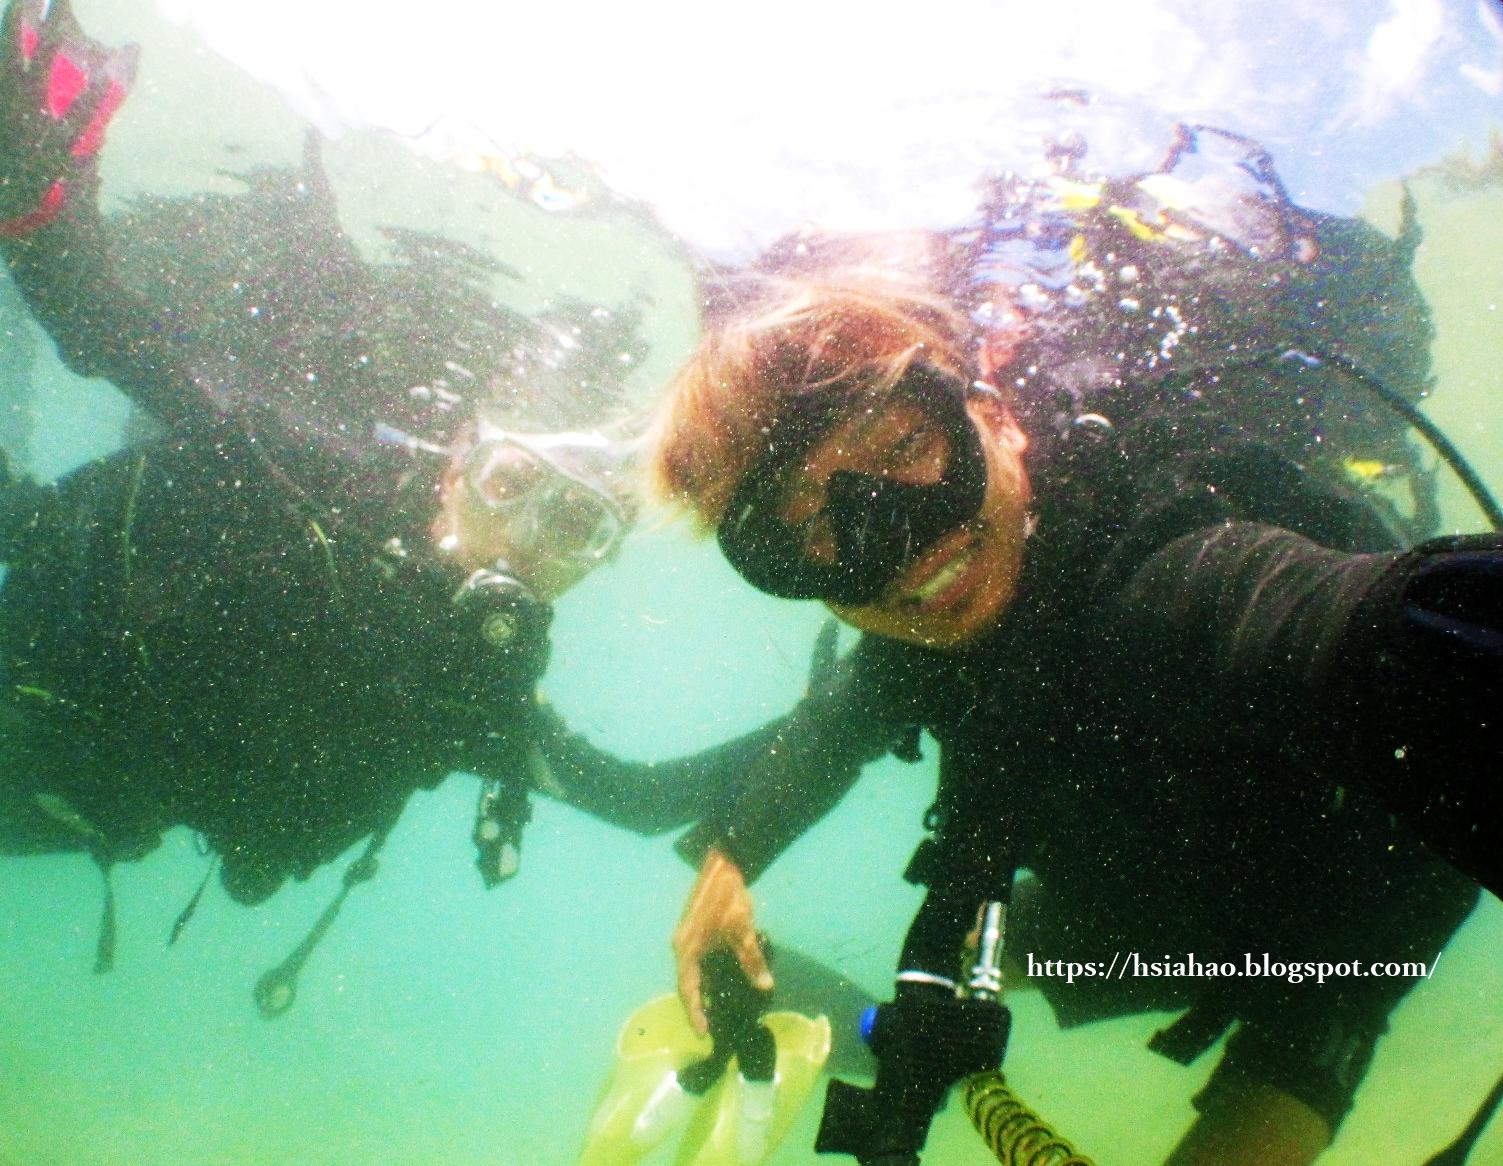 沖繩-推薦-景點-真榮田岬-青之洞窟-潛水-浮潛-青の洞窟-自由行-旅遊-Okinawa-diving-snorkeling-maeda-cape-blue-cave